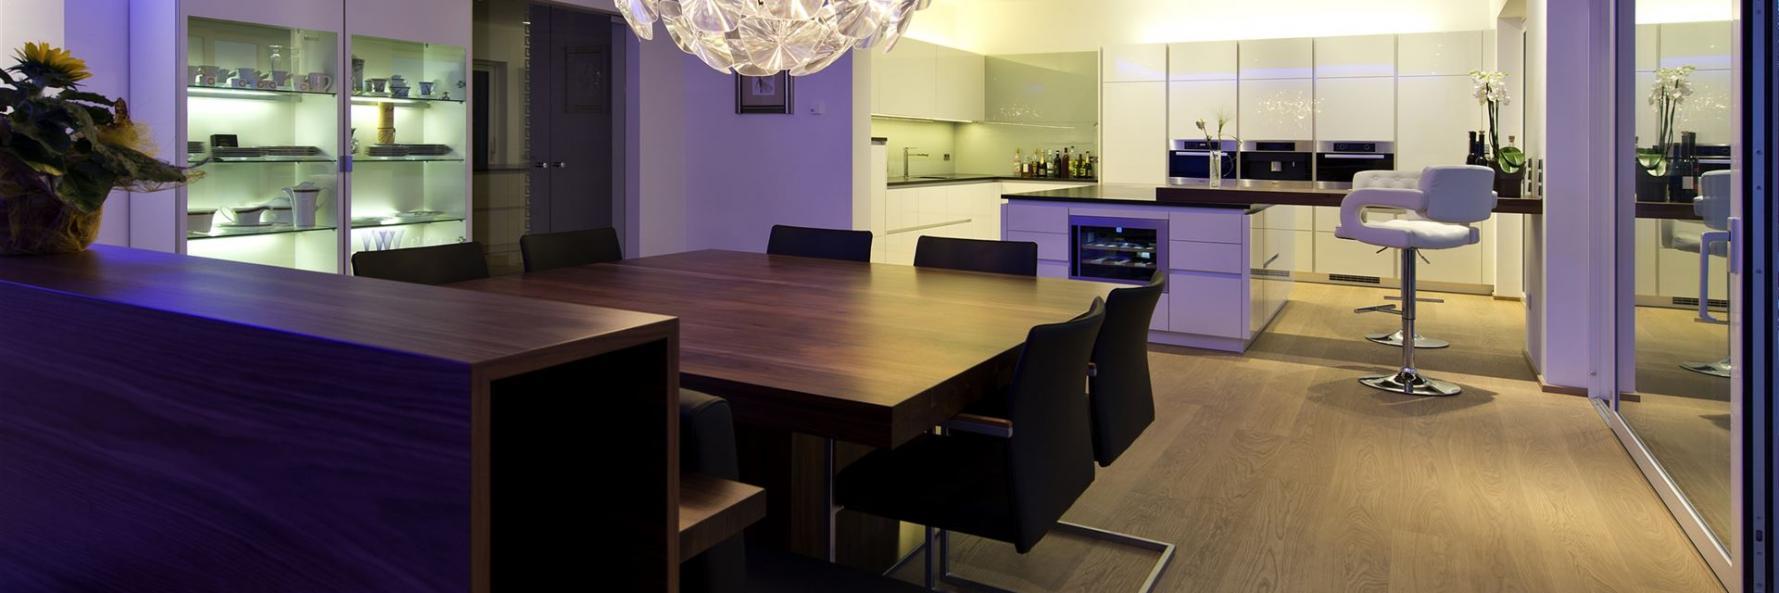 wert haus. Black Bedroom Furniture Sets. Home Design Ideas